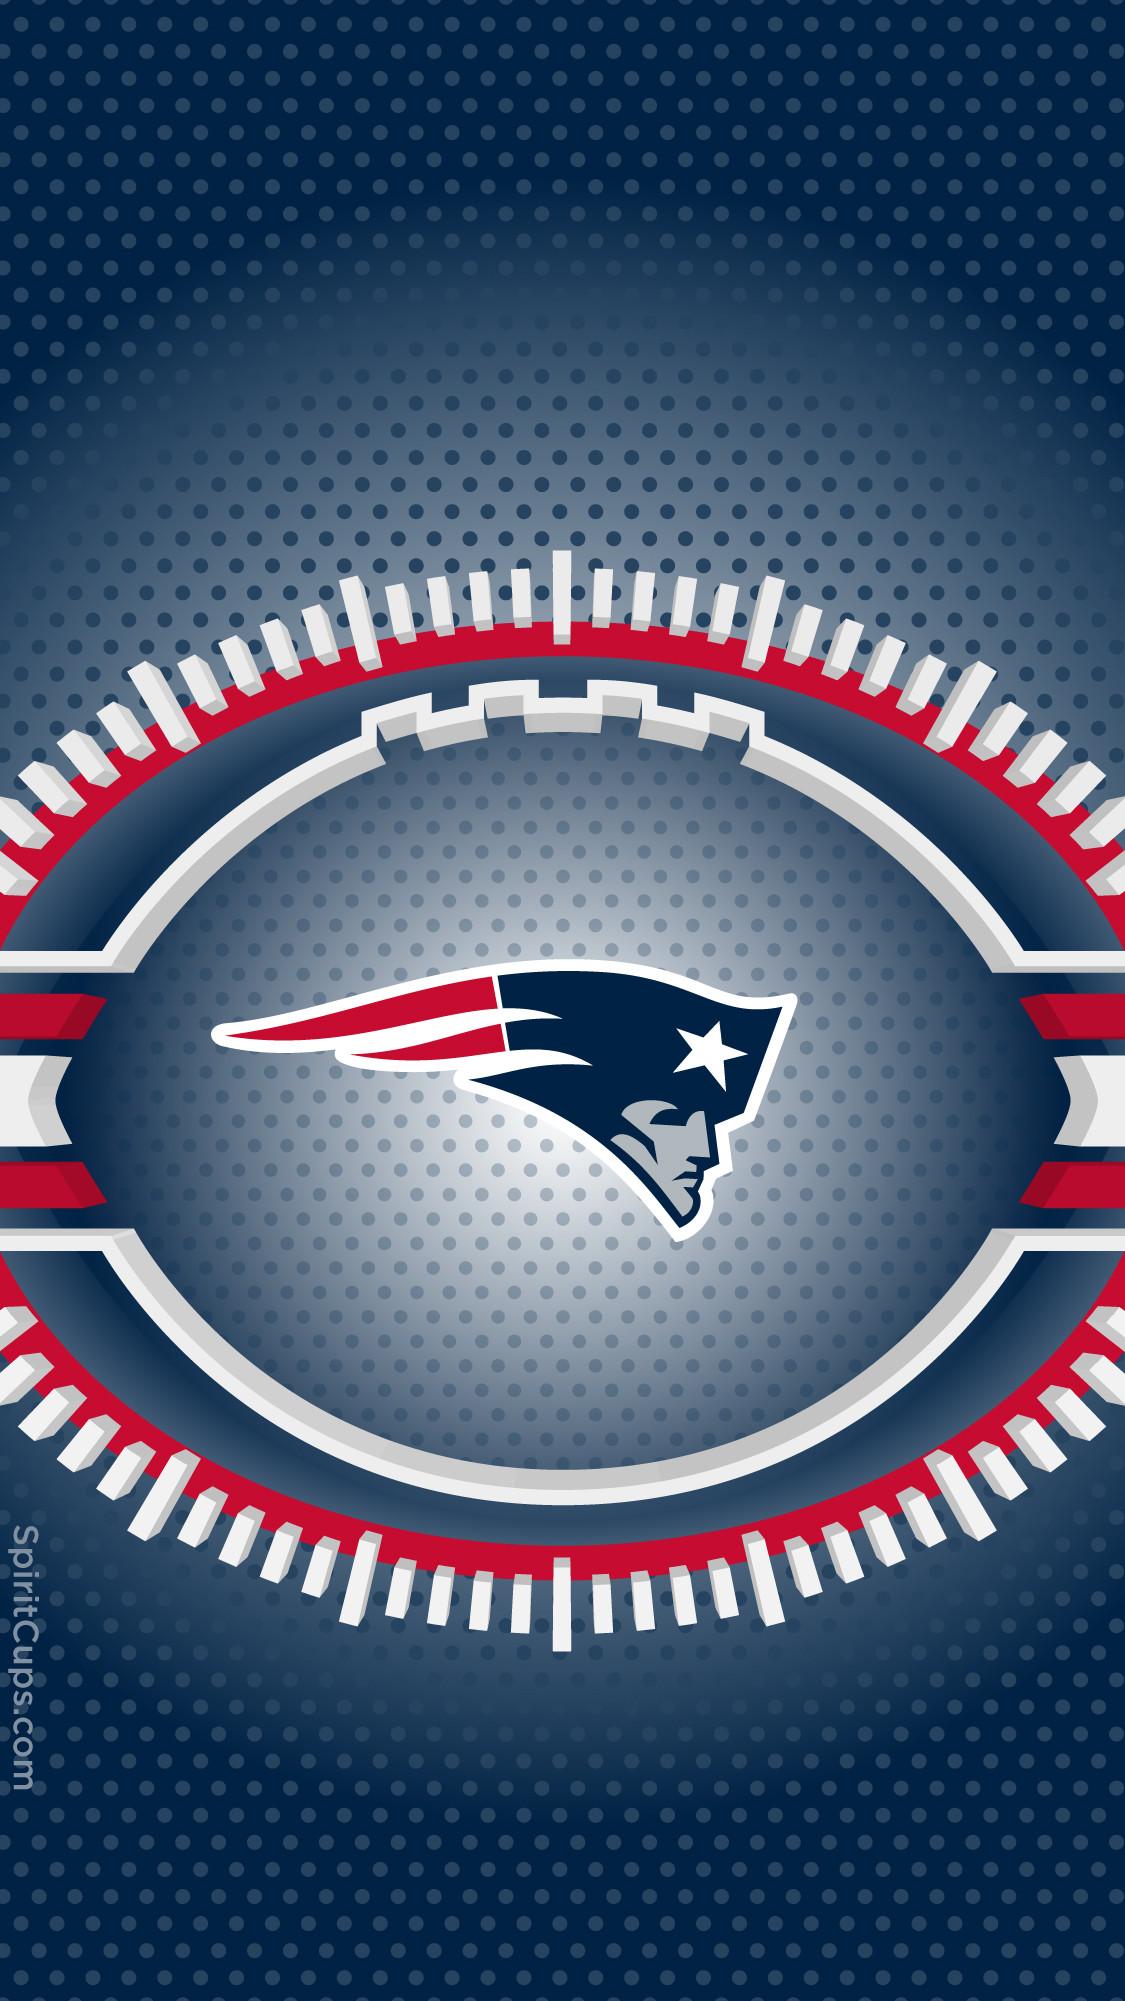 Raiders Logo Wallpaper Iphone New England Patriots Logo Wallpaper 72 Images